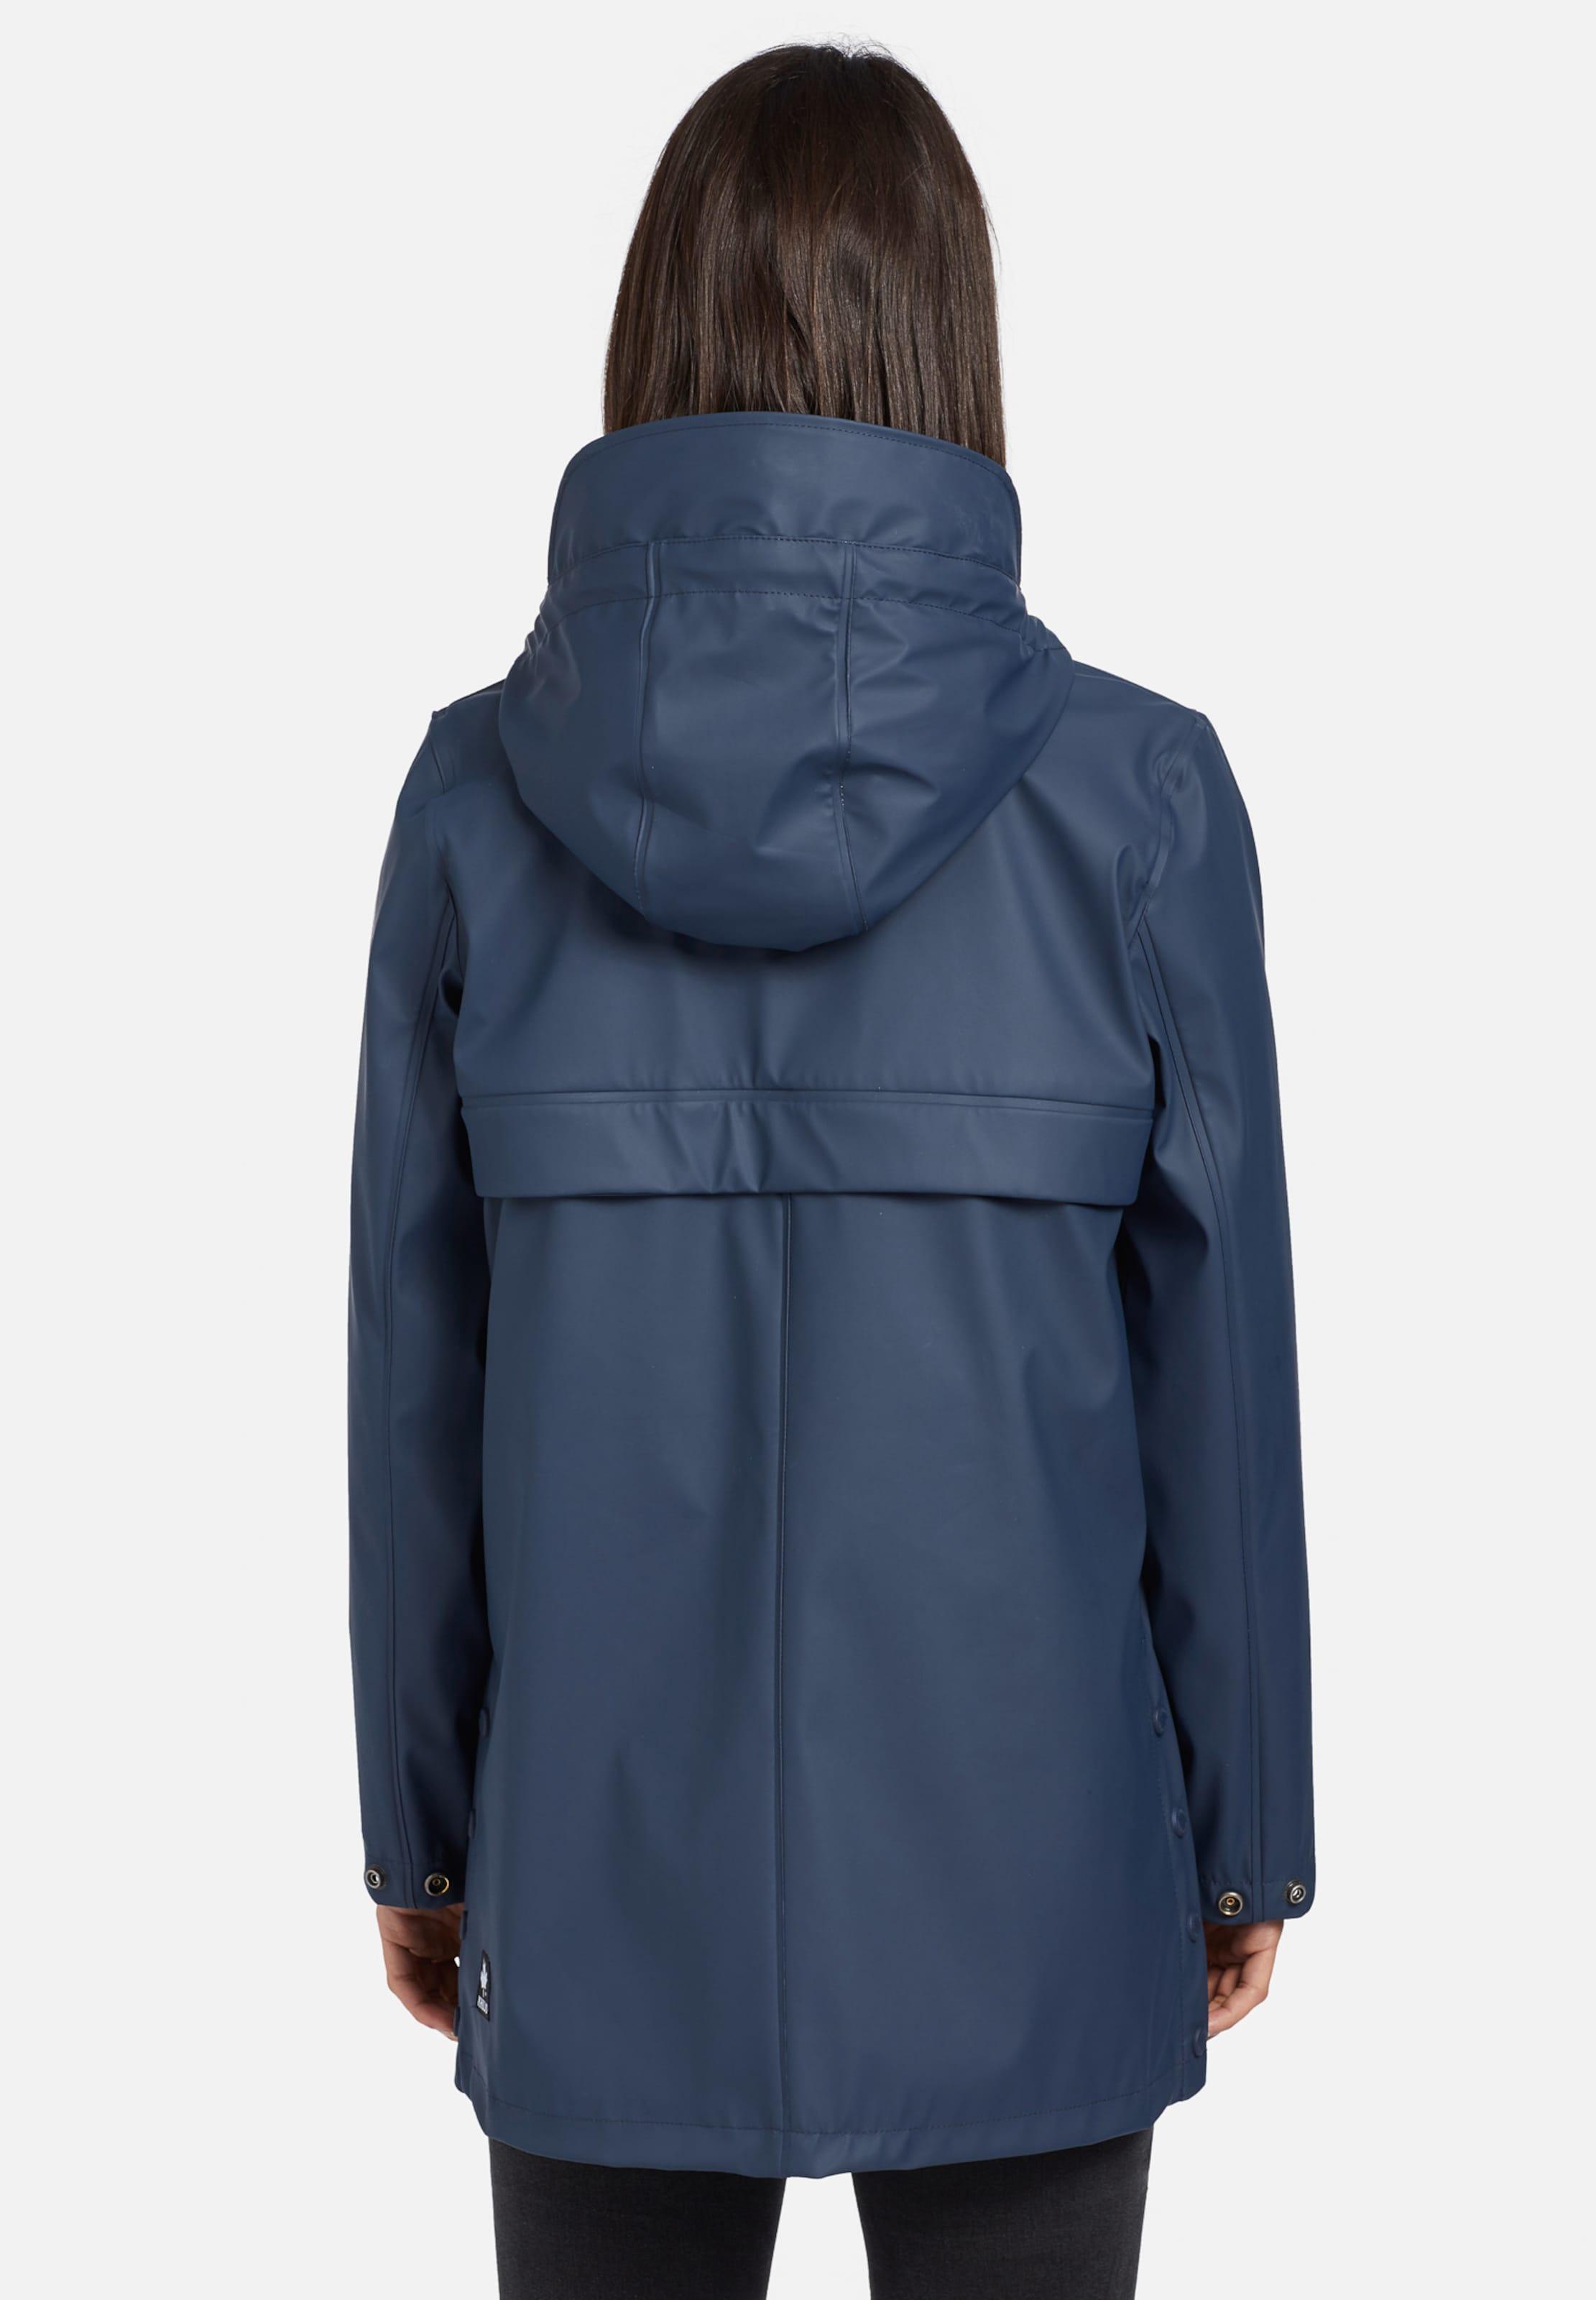 Mantel In Khujo Wei BlauSchwarz Nancy ' c4jS5R3LqA